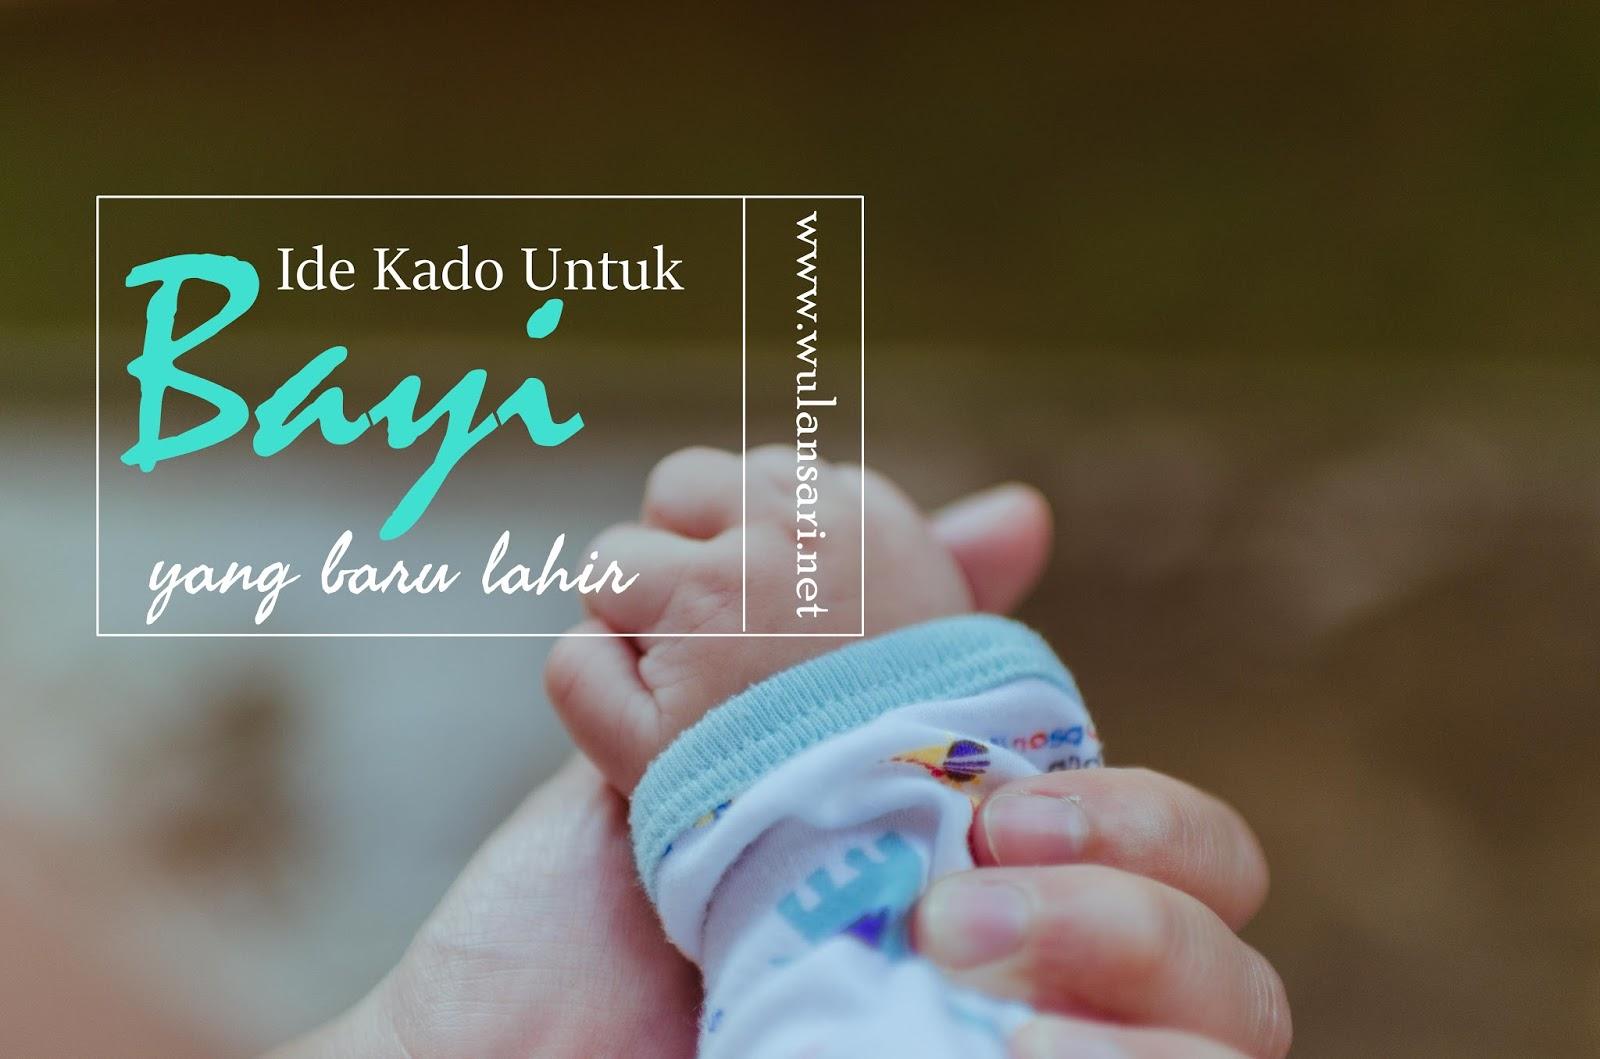 Ide Kado Untuk Bayi Yang Baru Lahir Wulan Kenanga